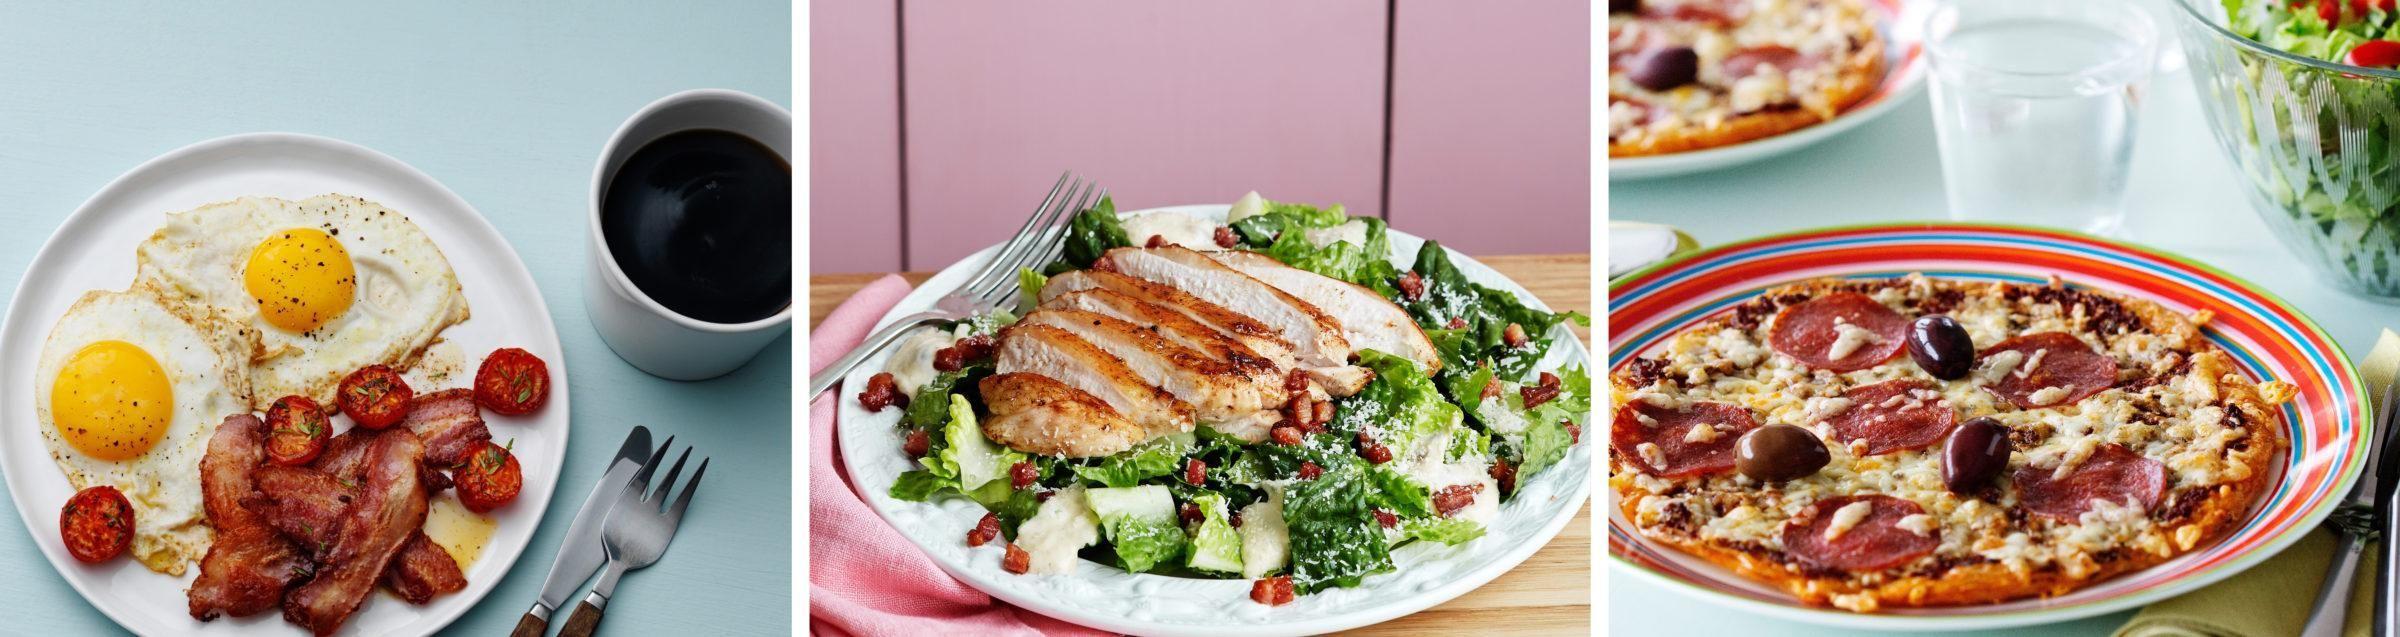 30 Day Meal Plan For Diabetics Week 3